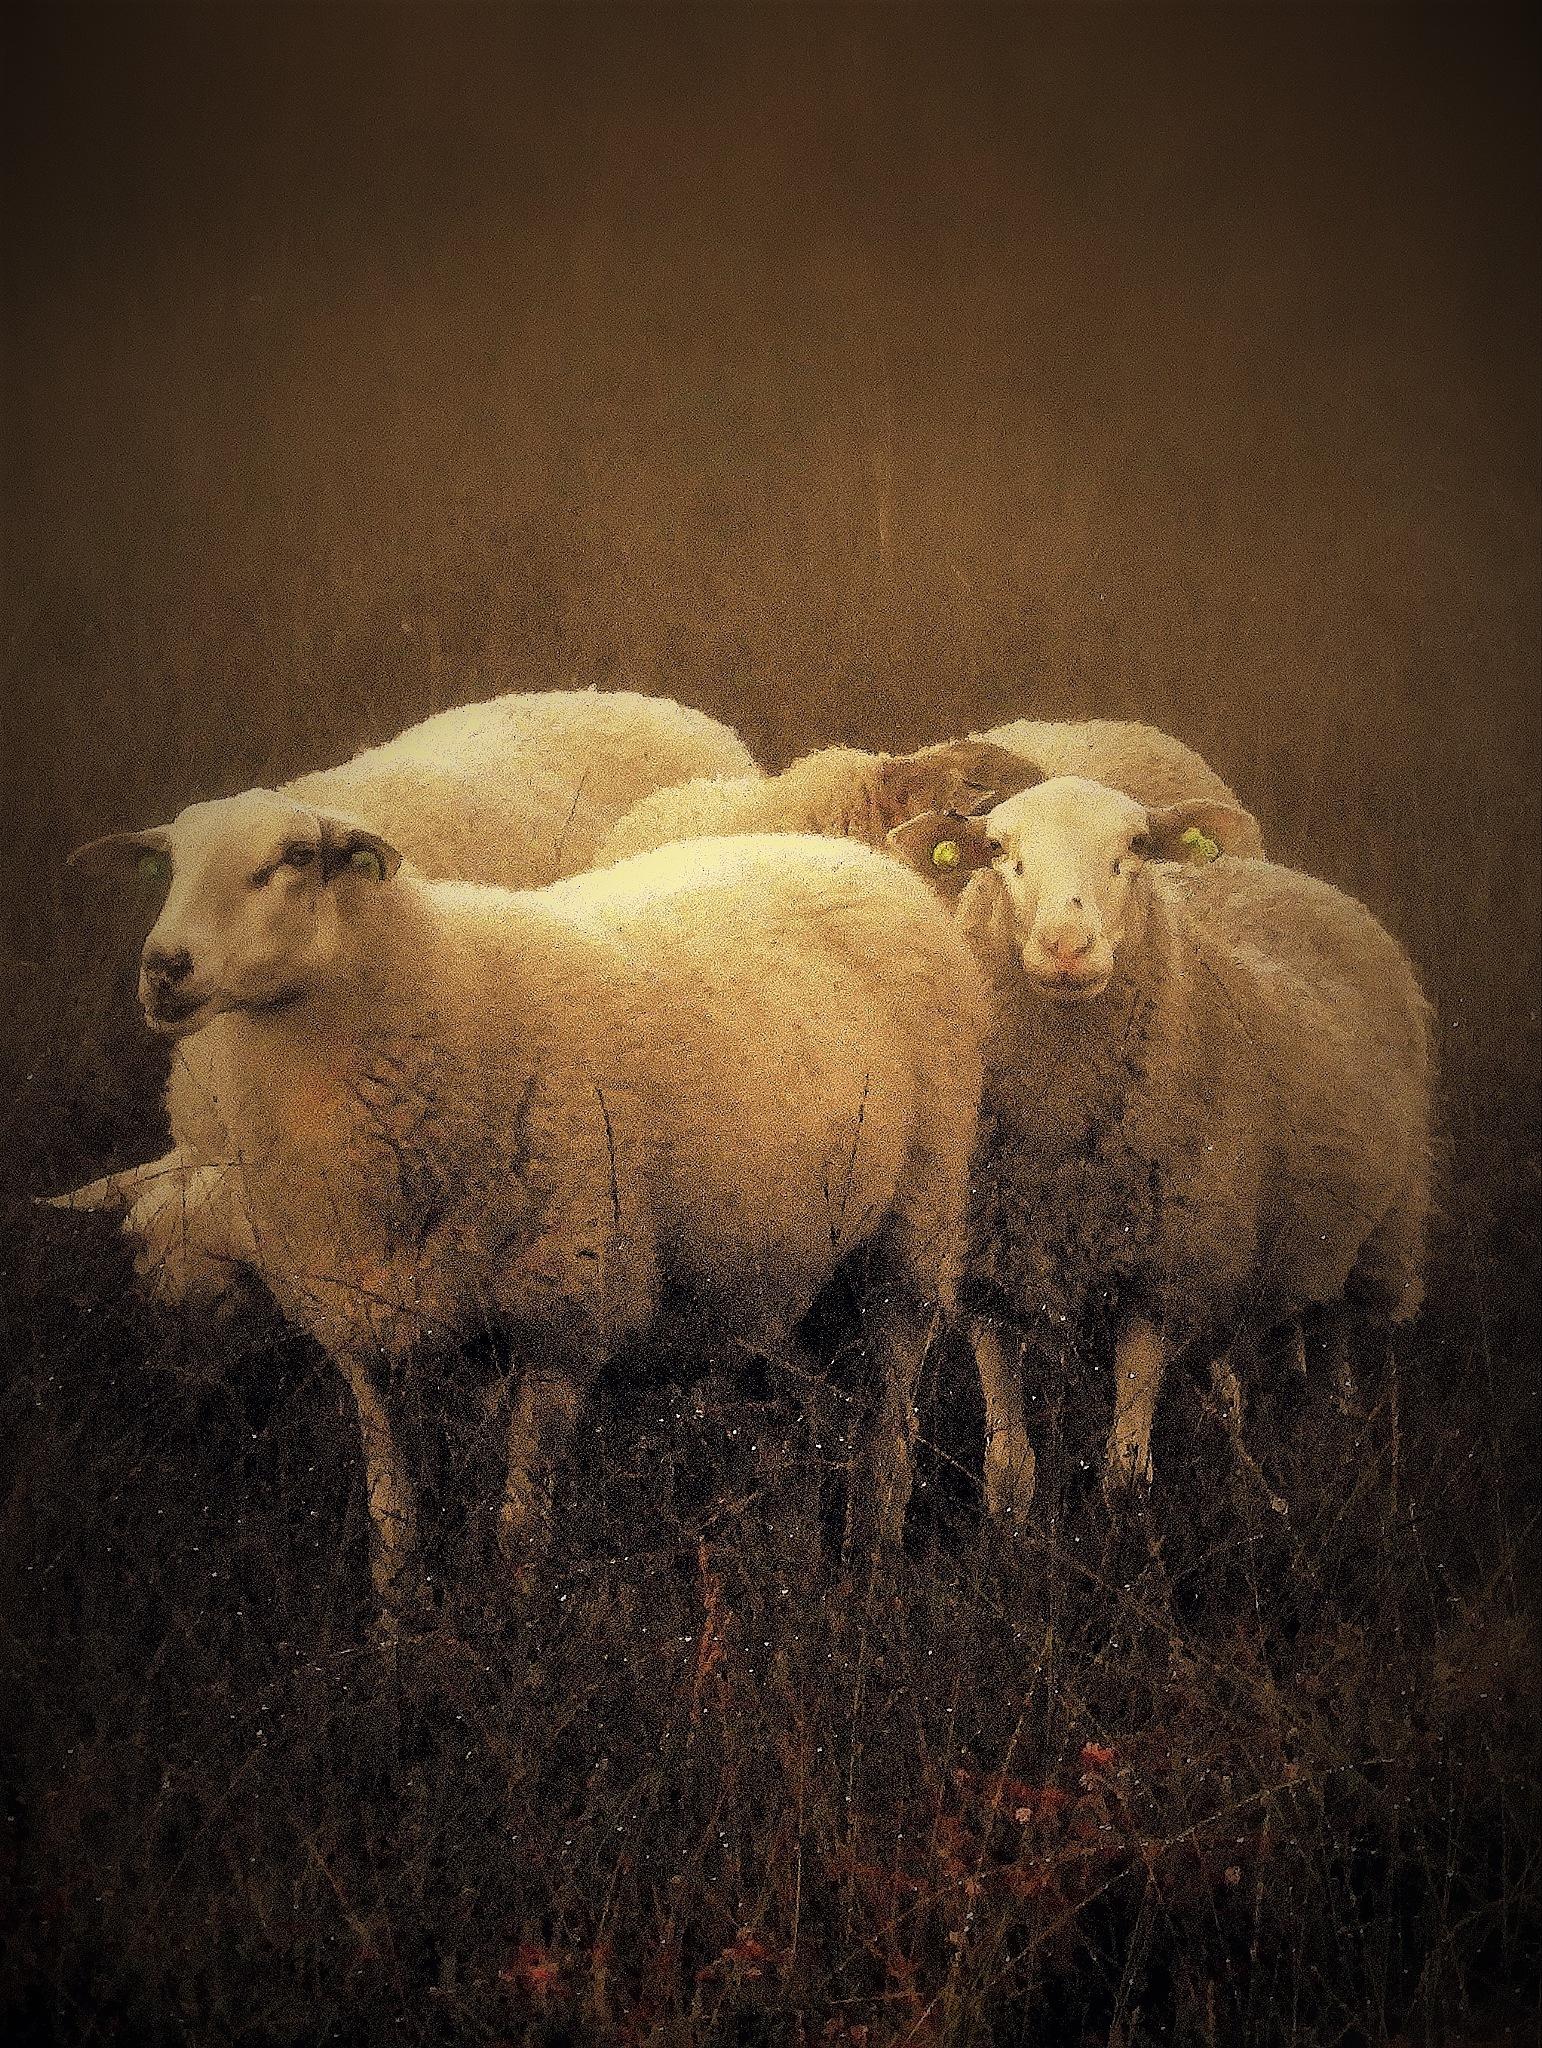 sheep by johan.vandergouw